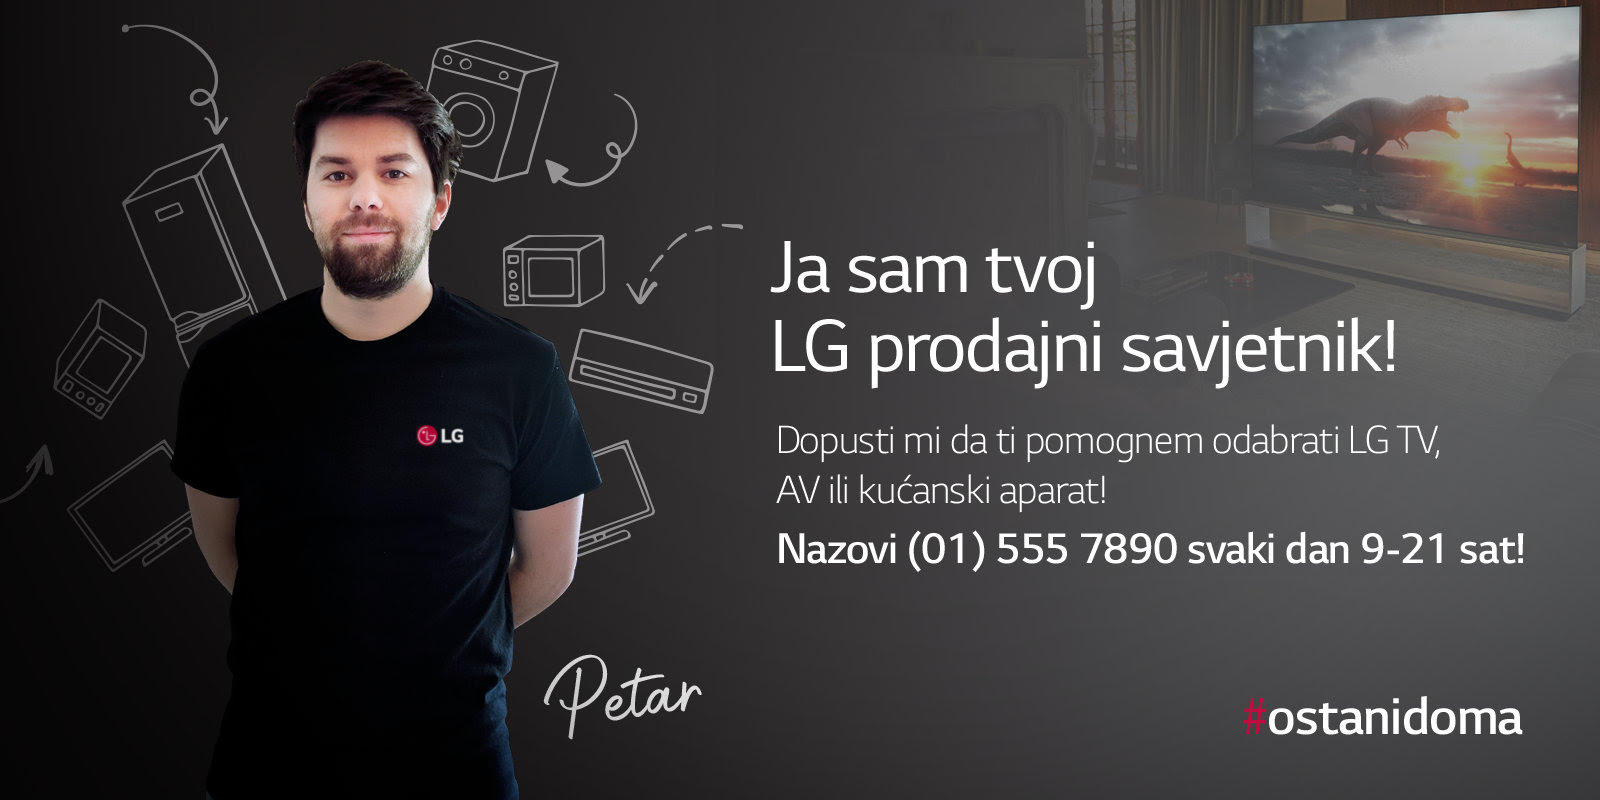 lg-online-promocija